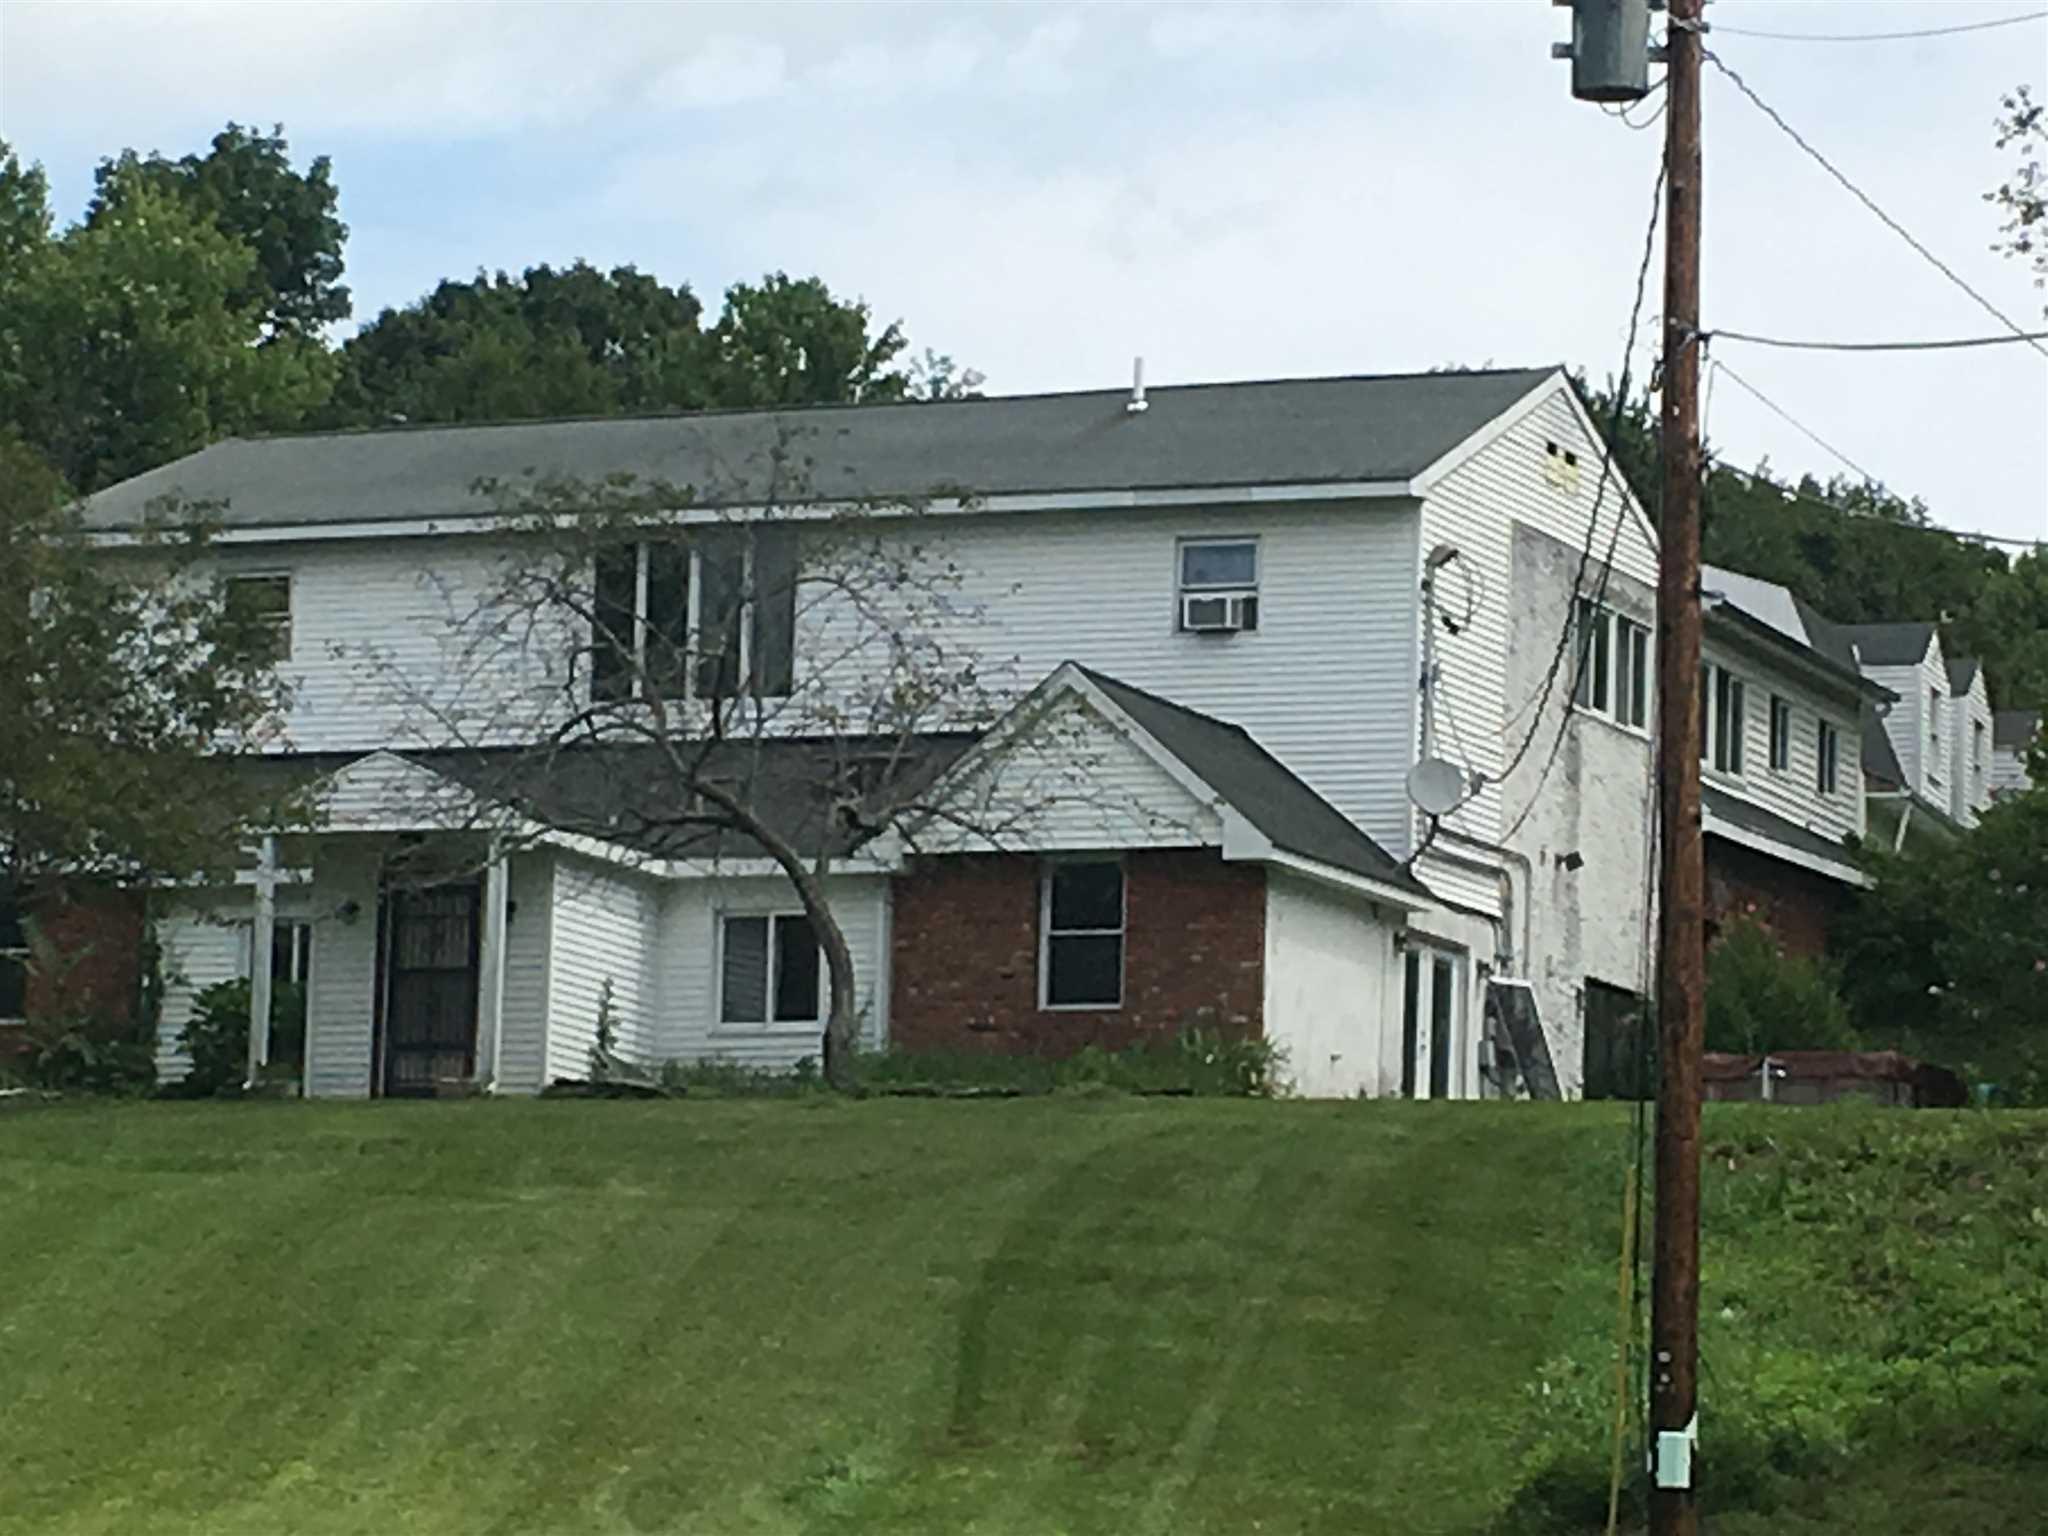 146 N SMITH RD, Union Vale, NY 12540